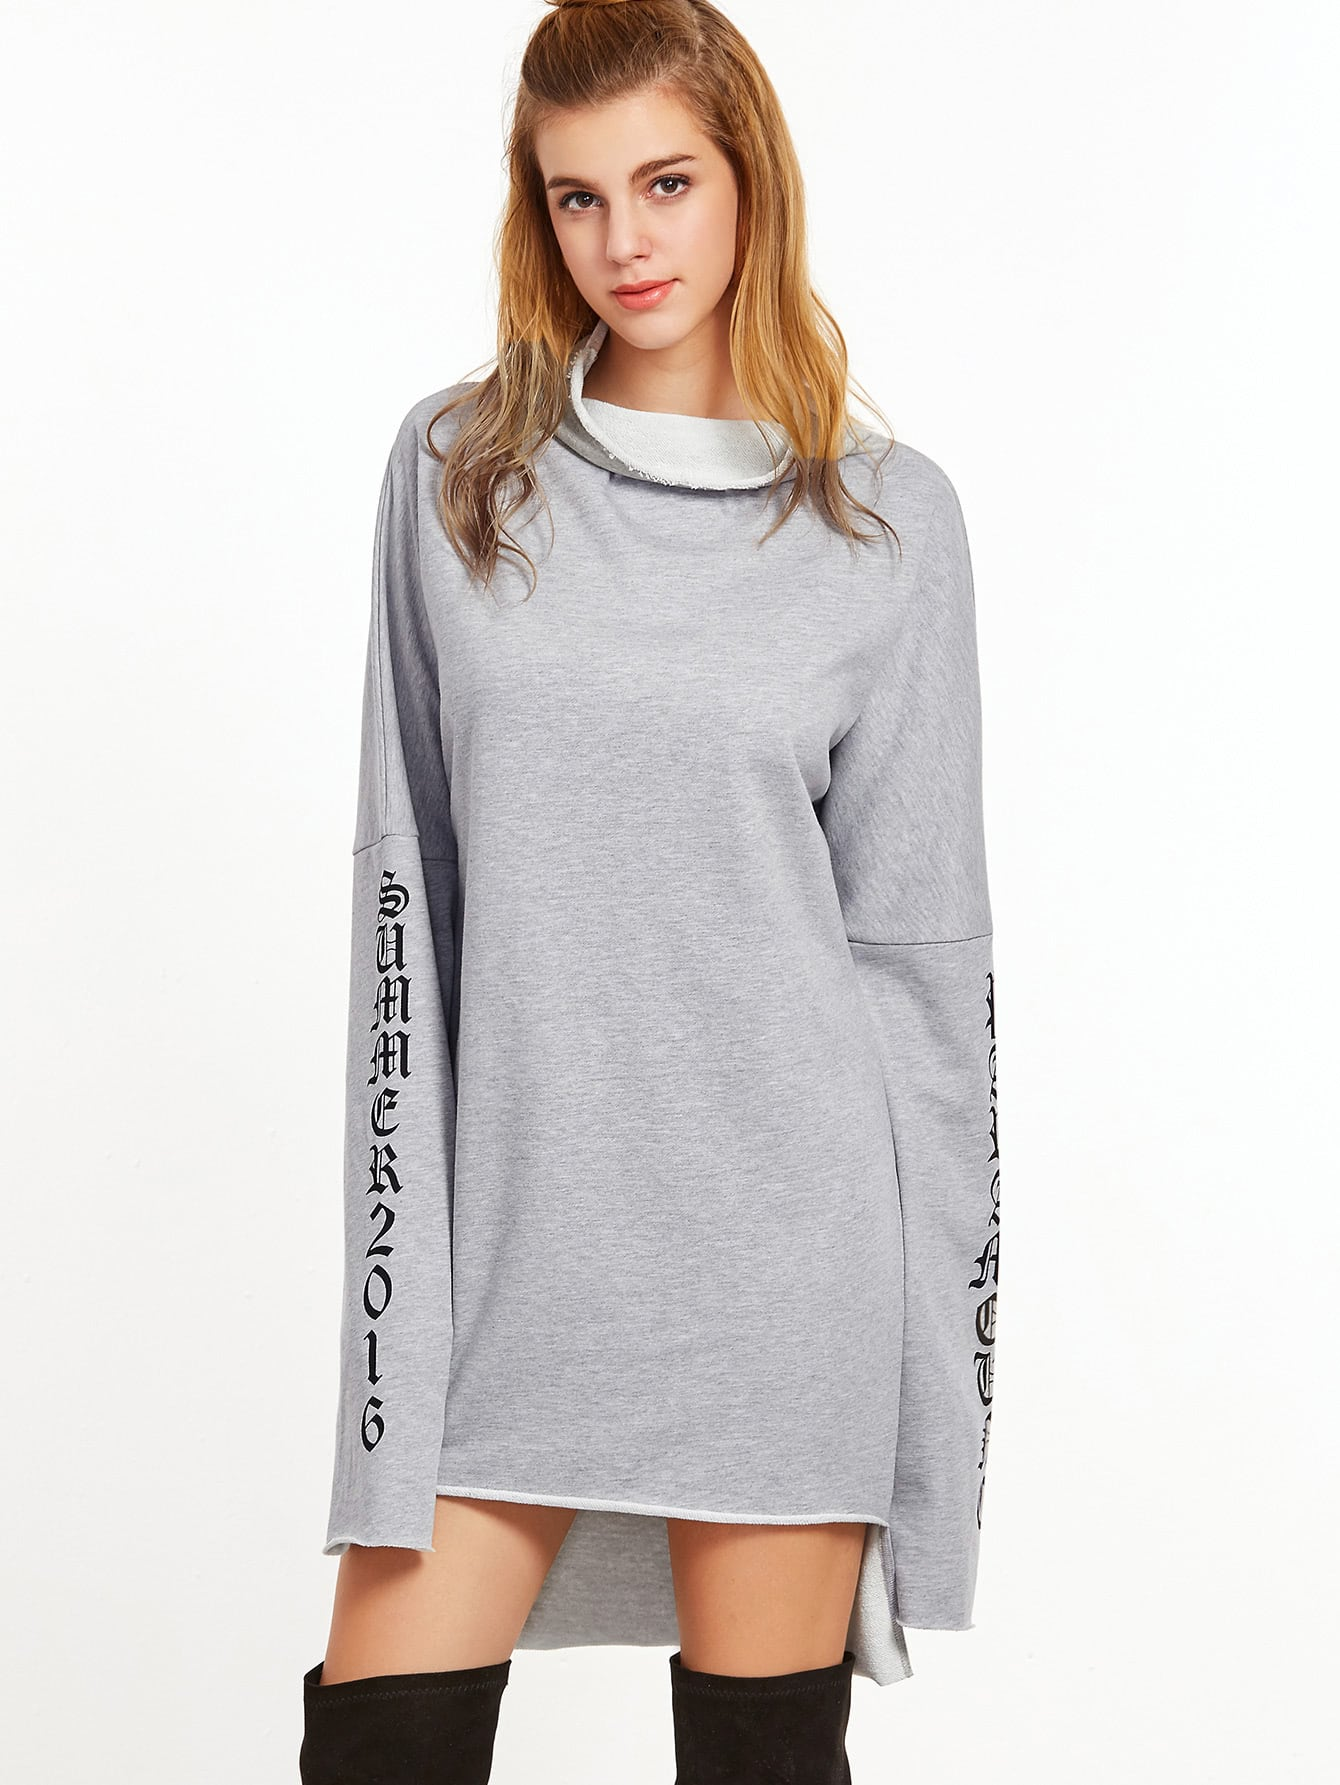 Sweatshirt kleid buchstaben druck umlegekragen vorne kurz - Sweatshirt kleid lang ...